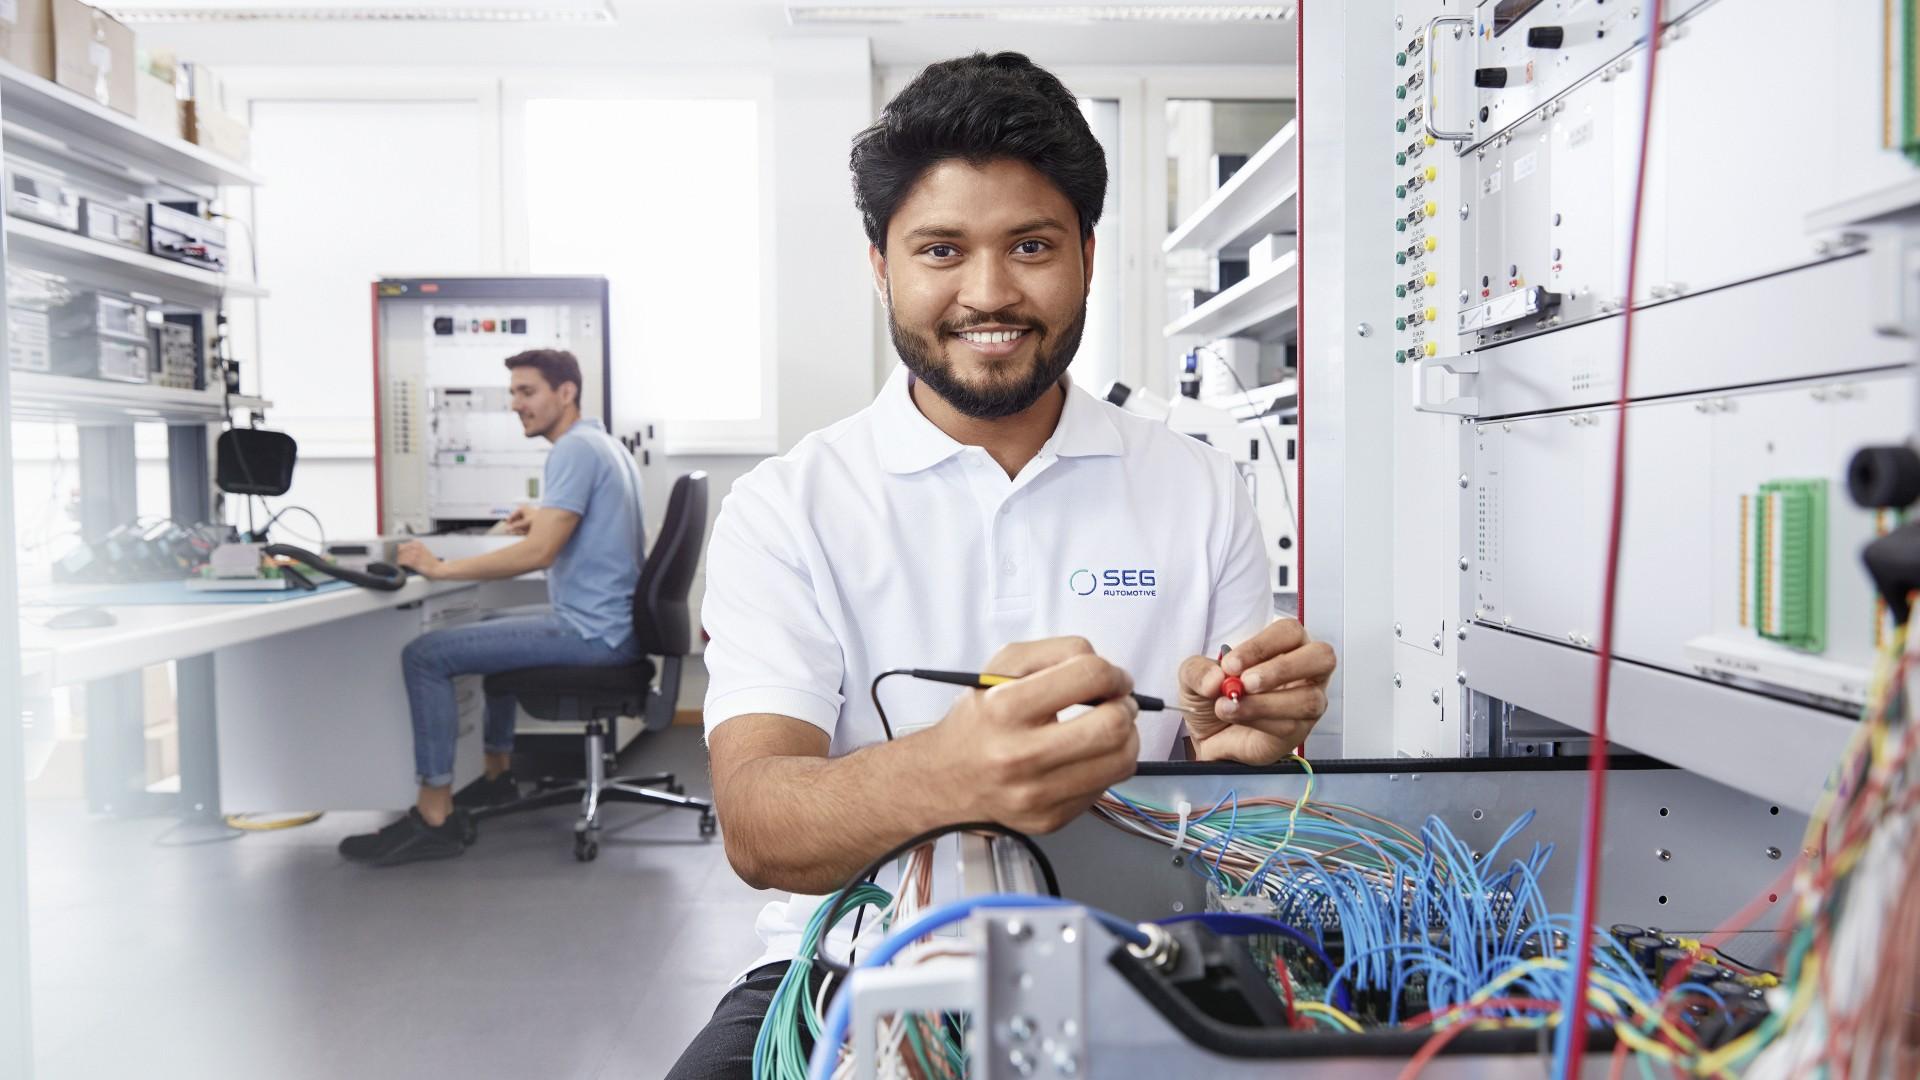 Engineer electronics hardware development